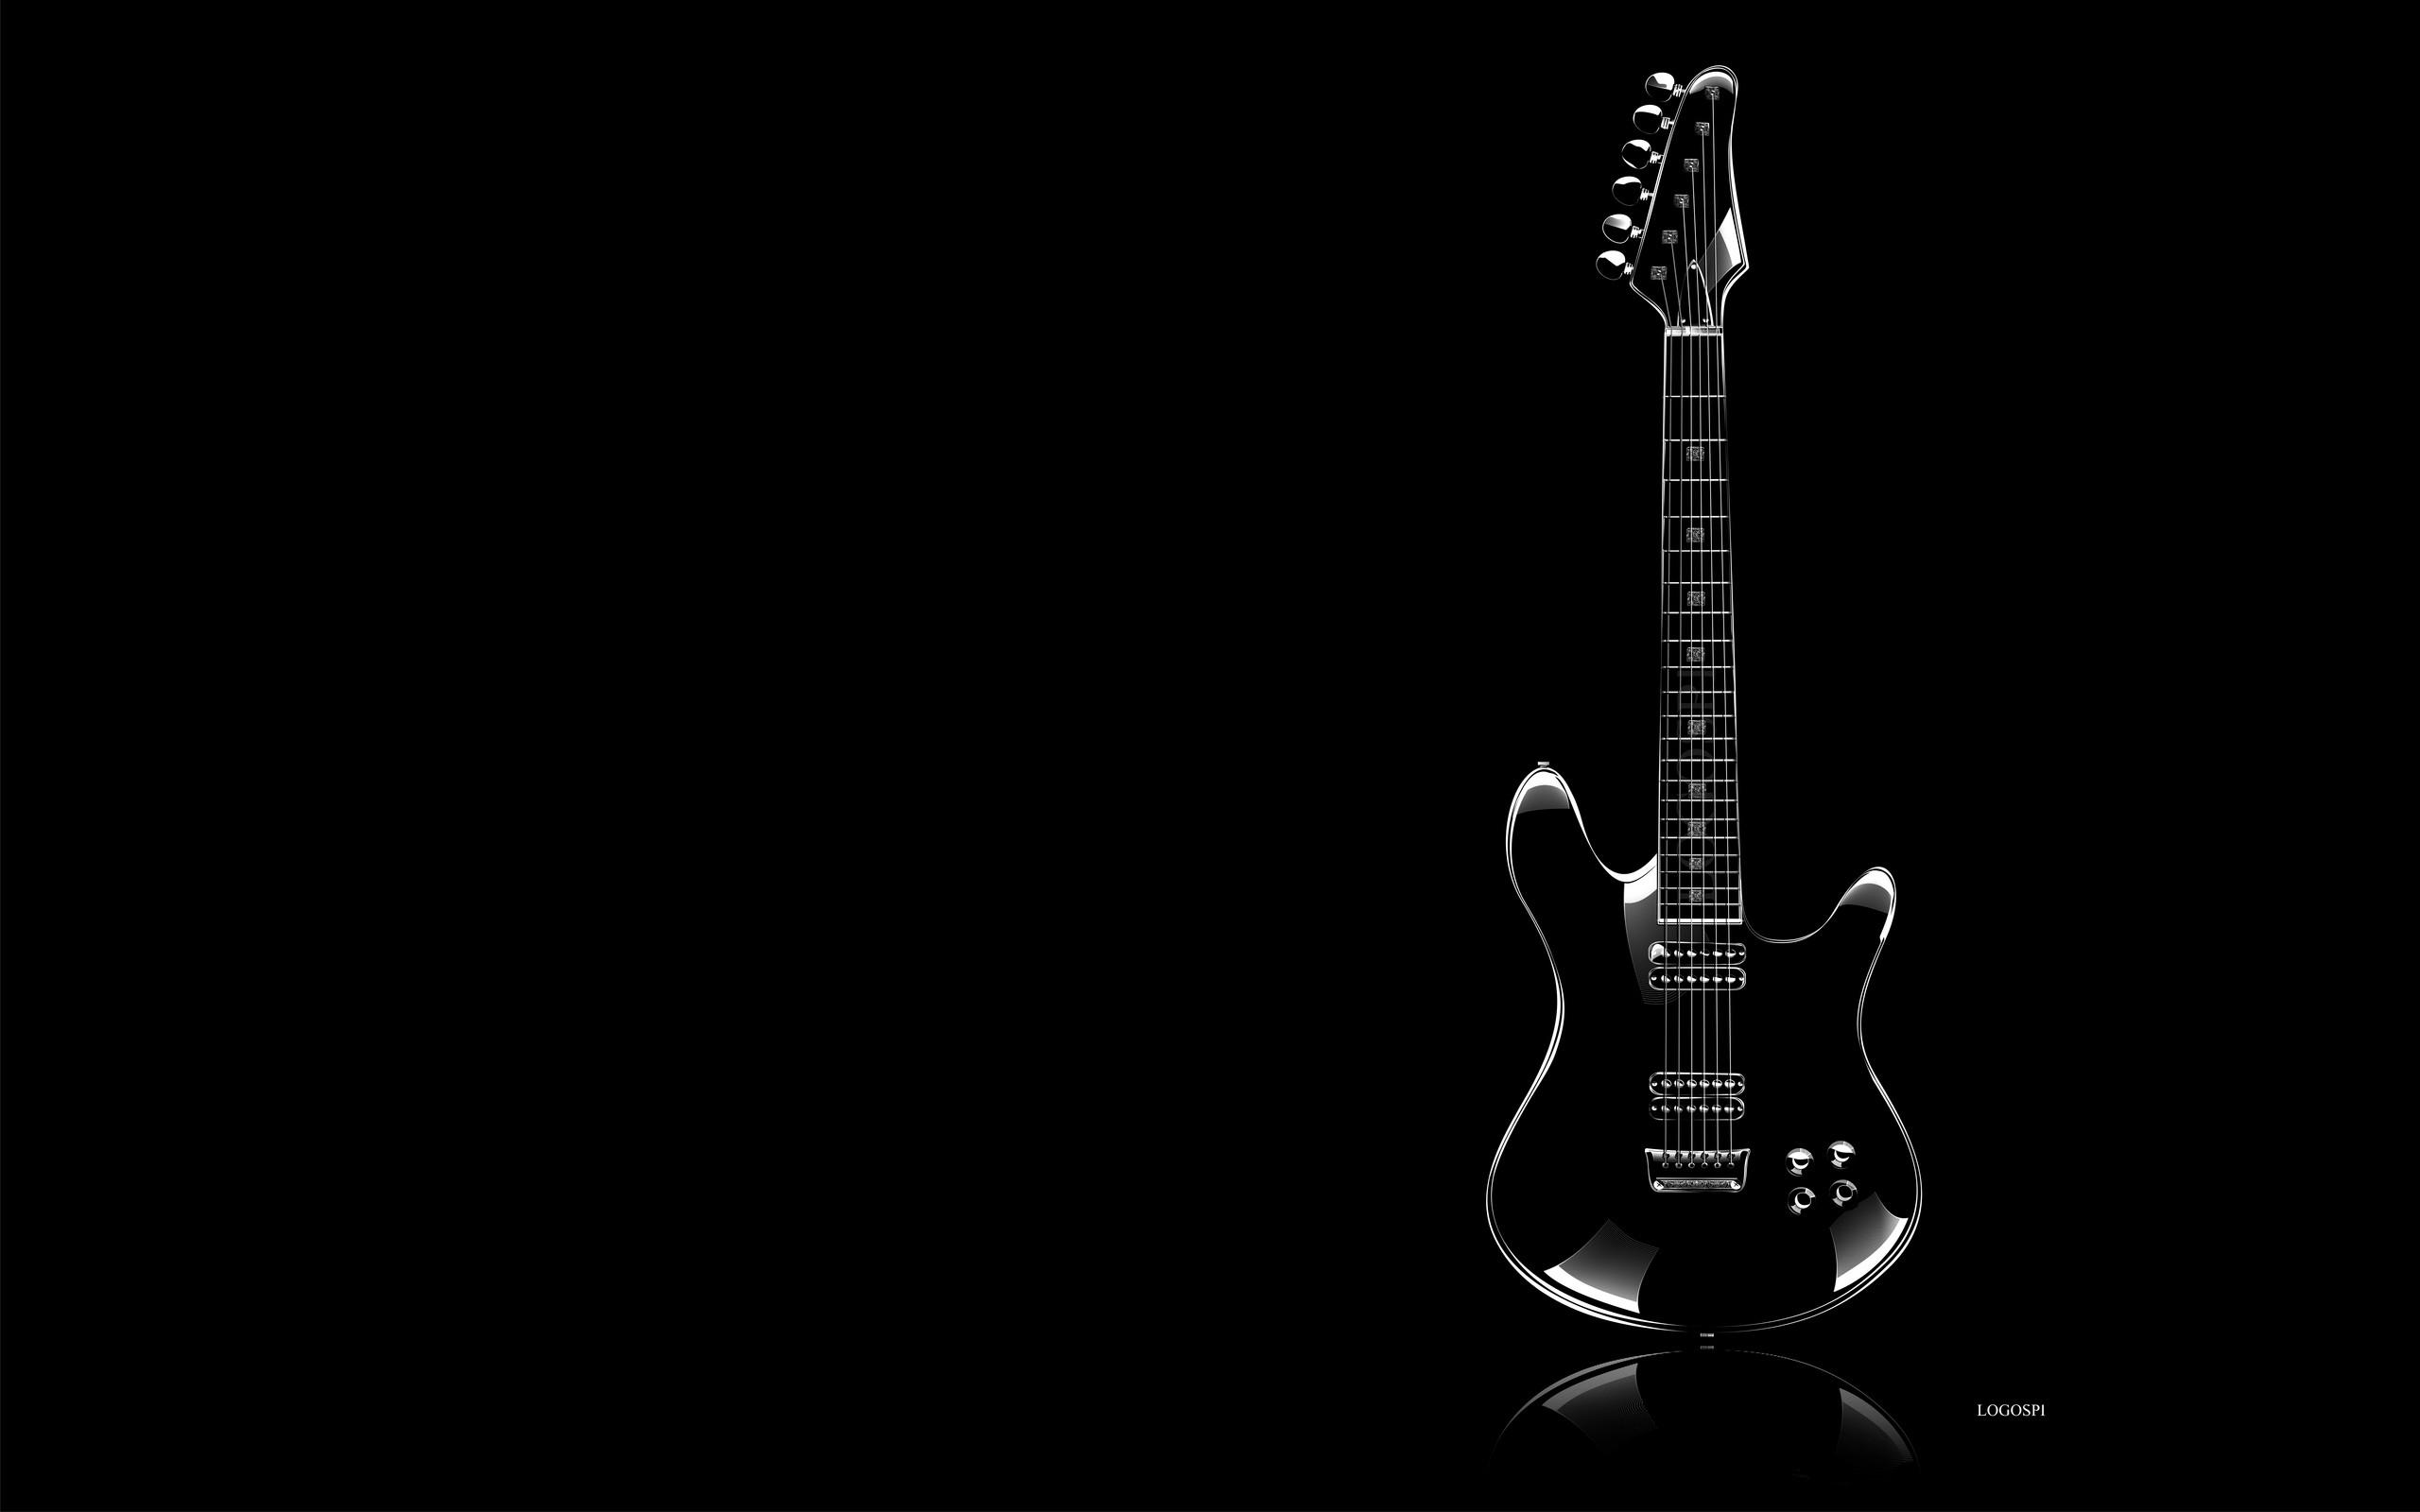 wallpaper.wiki-Black-guitar-deadpool-logo-phone-PIC-